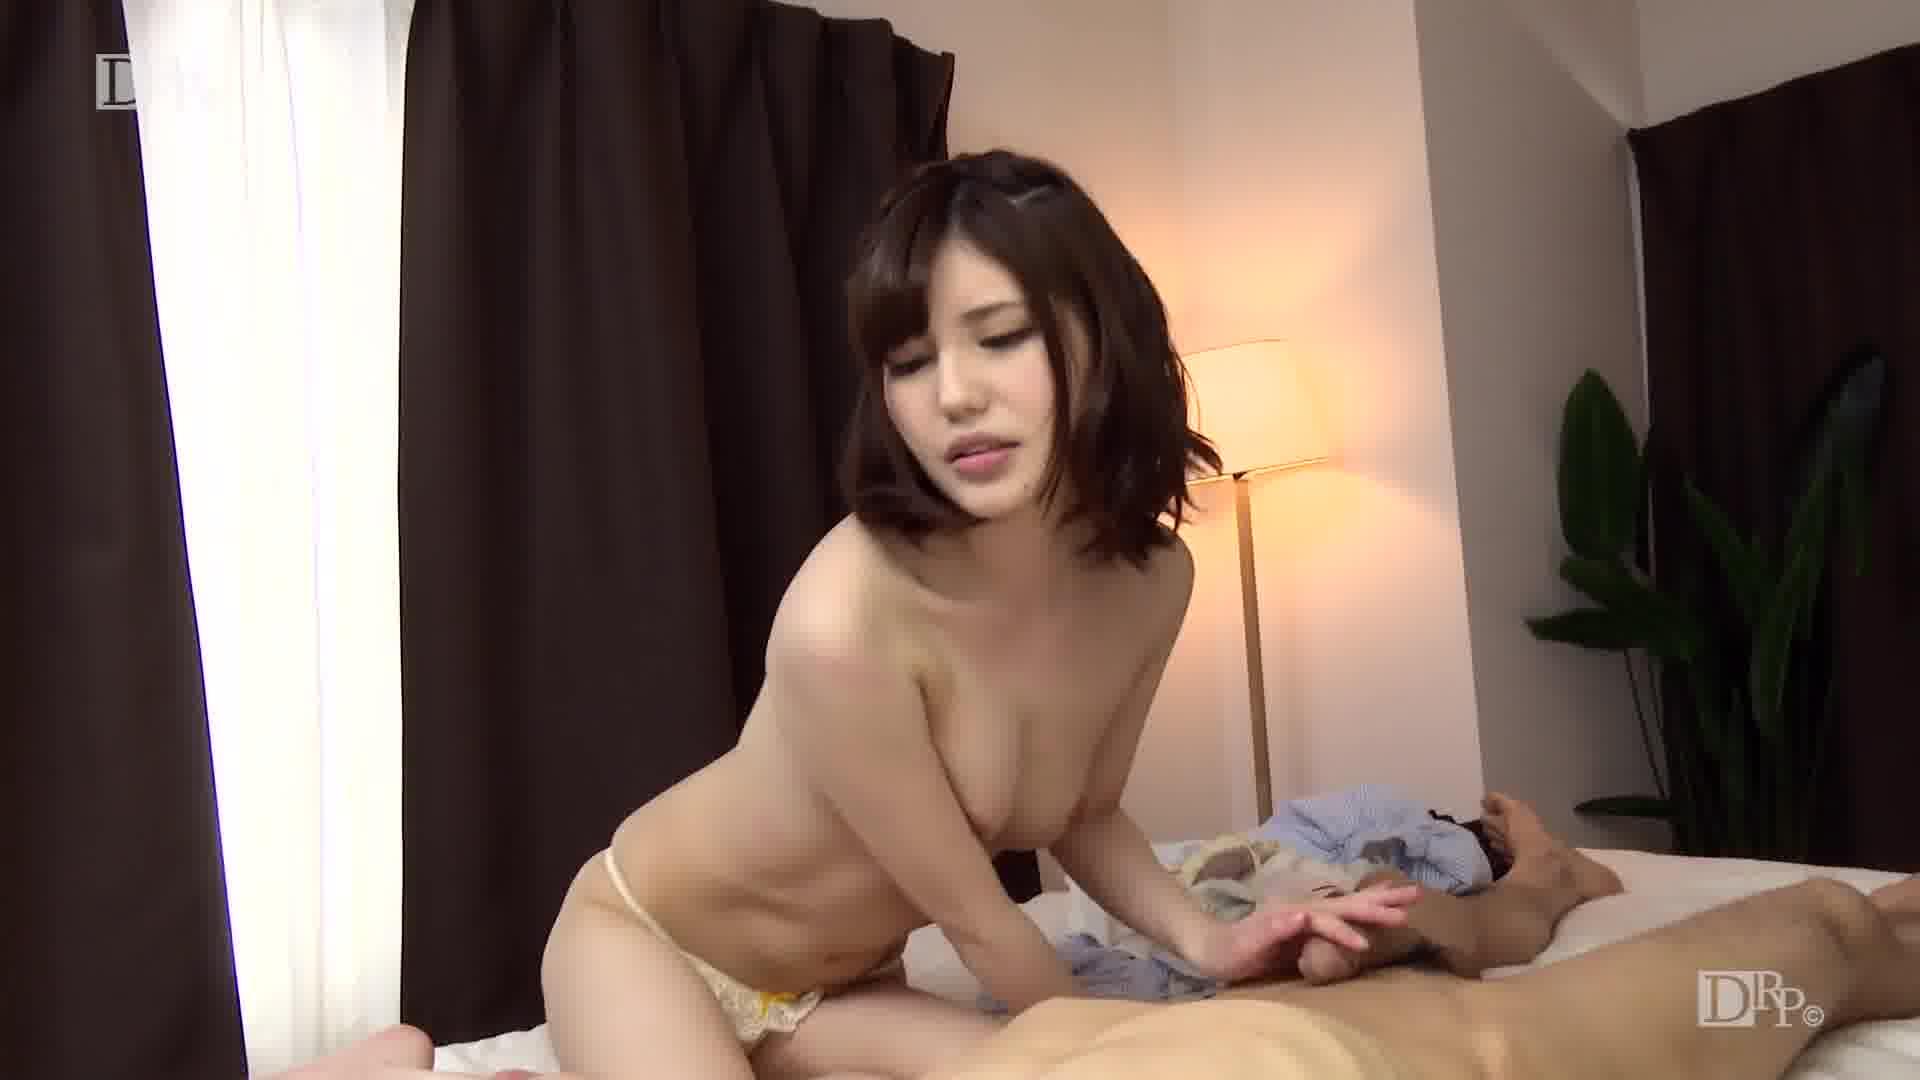 THE 未公開 ~天使のソフトタッチ手コキ~ - 水咲菜々美【痴女・パイパン・ベスト】